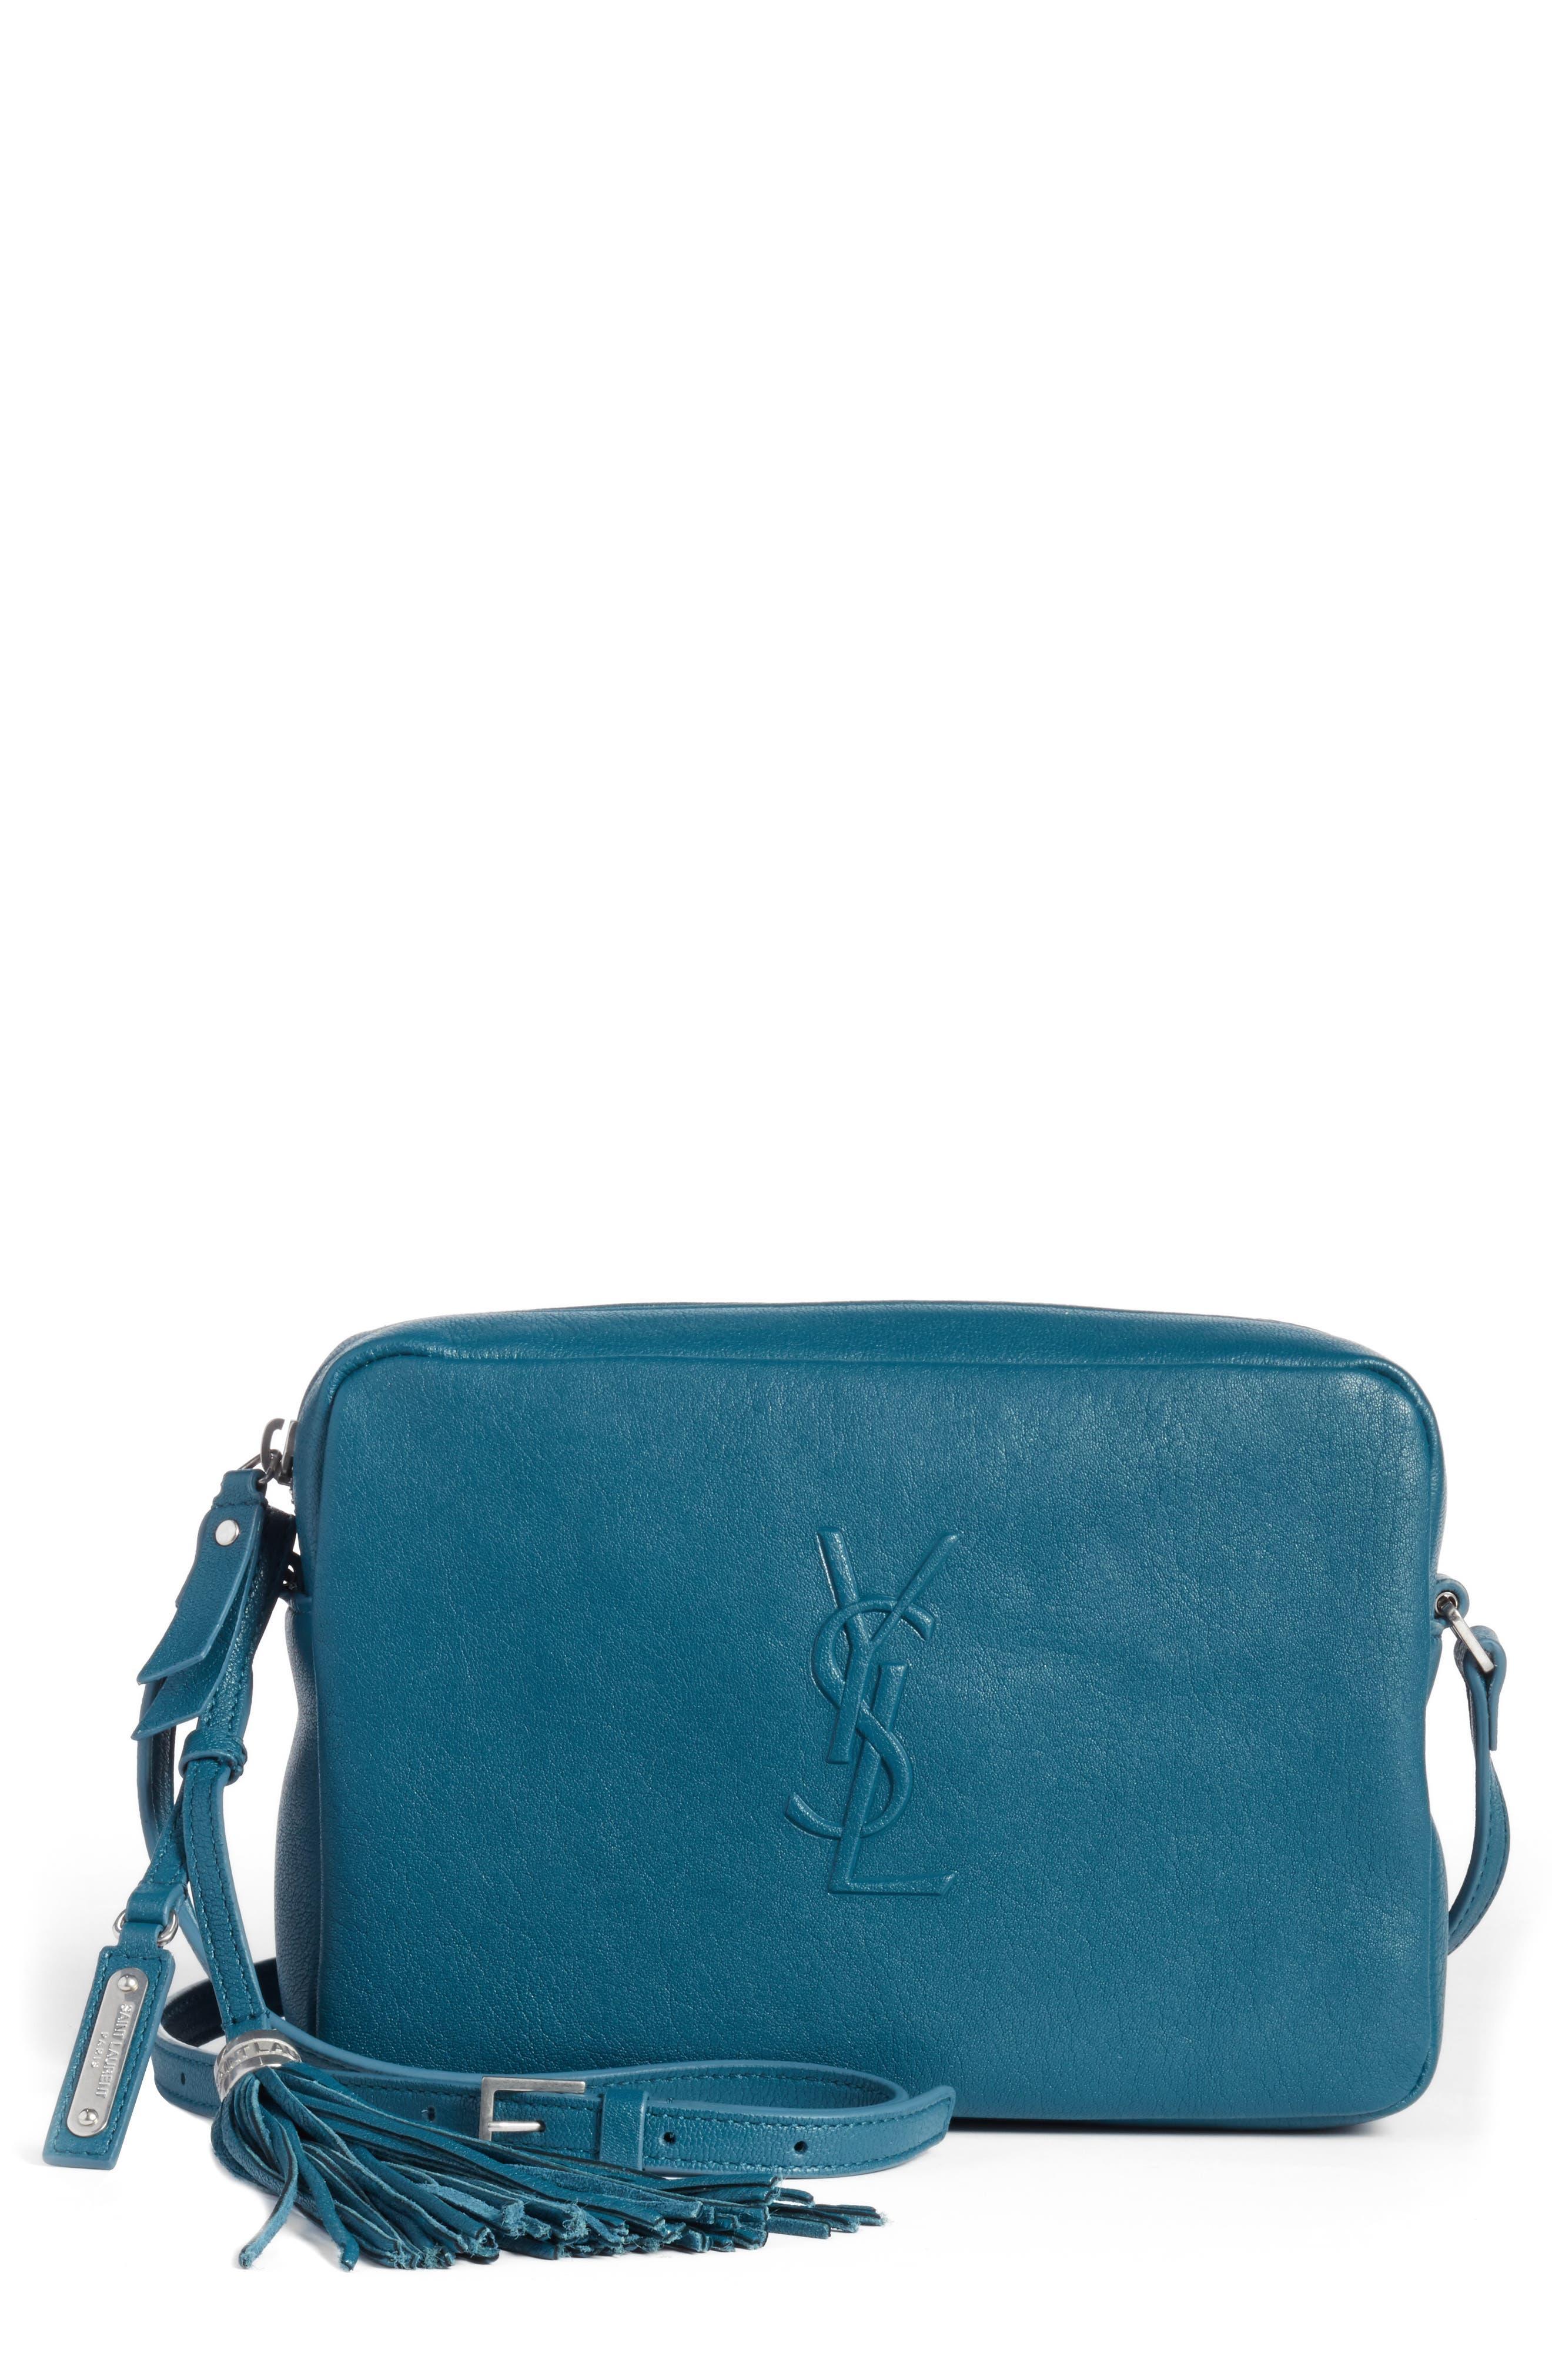 Main Image - Saint Laurent Small Mono Leather Camera Bag